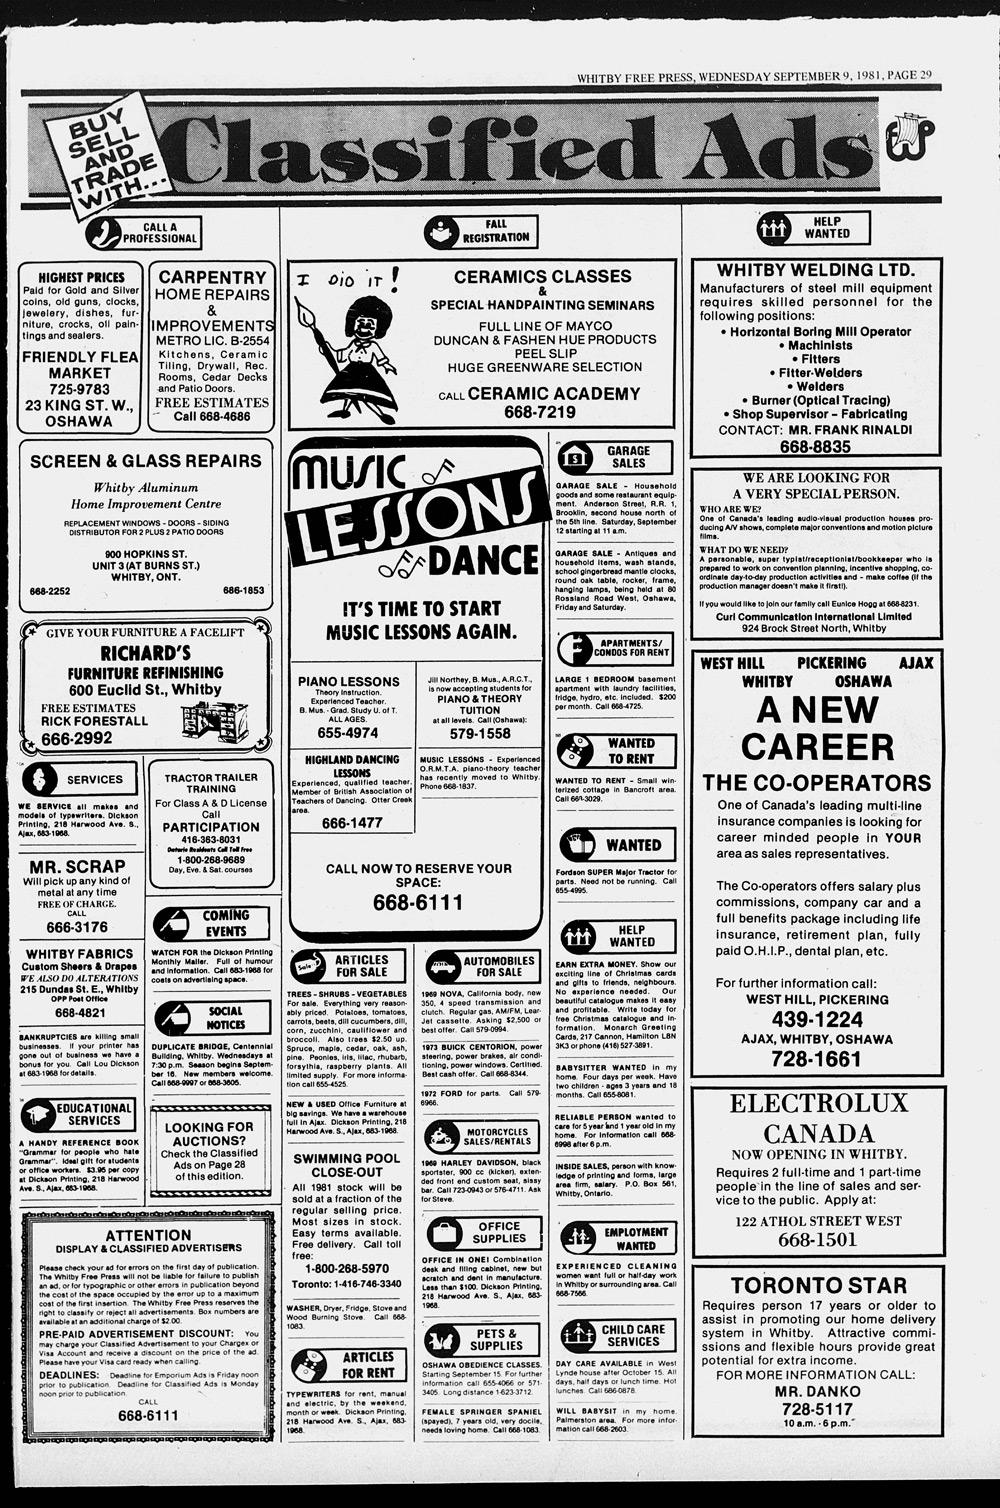 Whitby Free Press, 9 Sep 1981